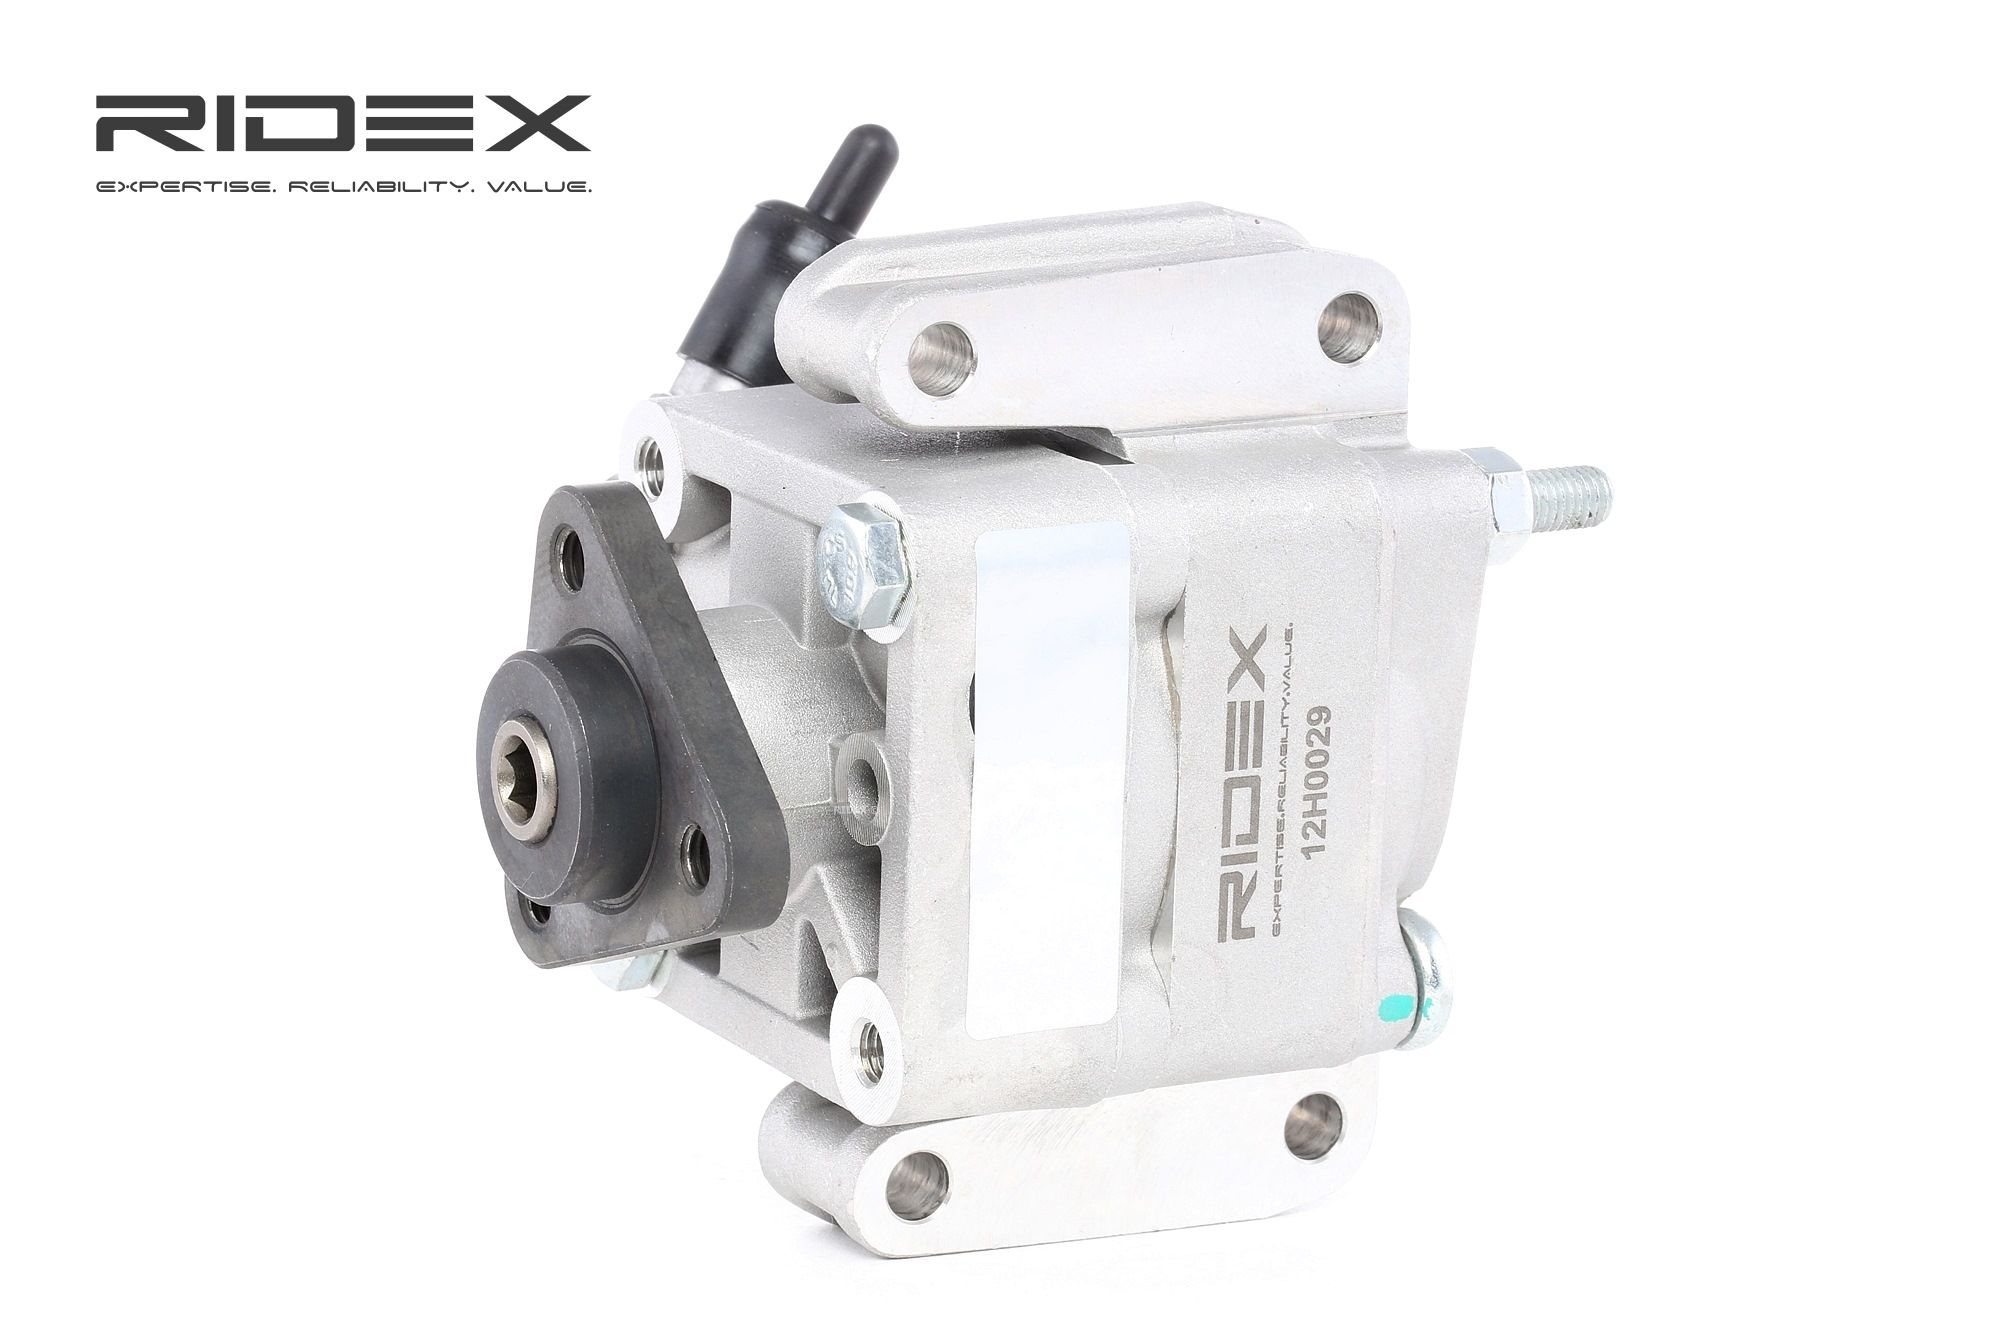 Servo pump RIDEX 12H0029 rating